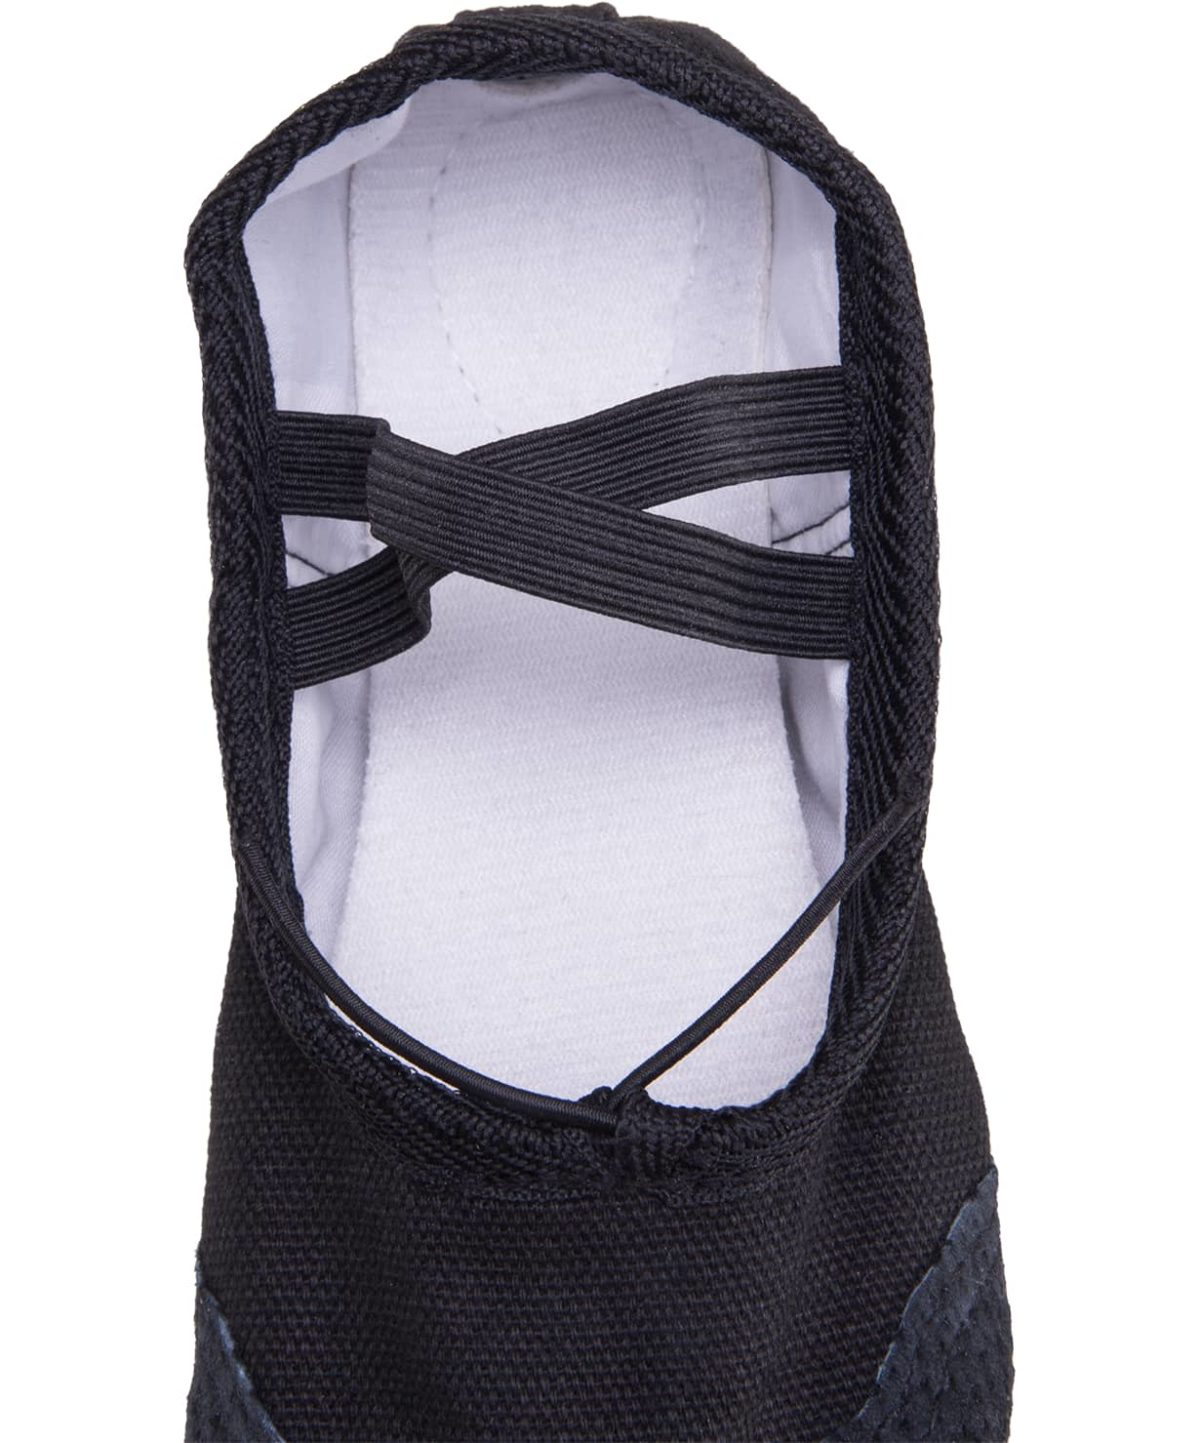 AMELY Балетки текстиль (38-42) SL-01: чёрный - 2